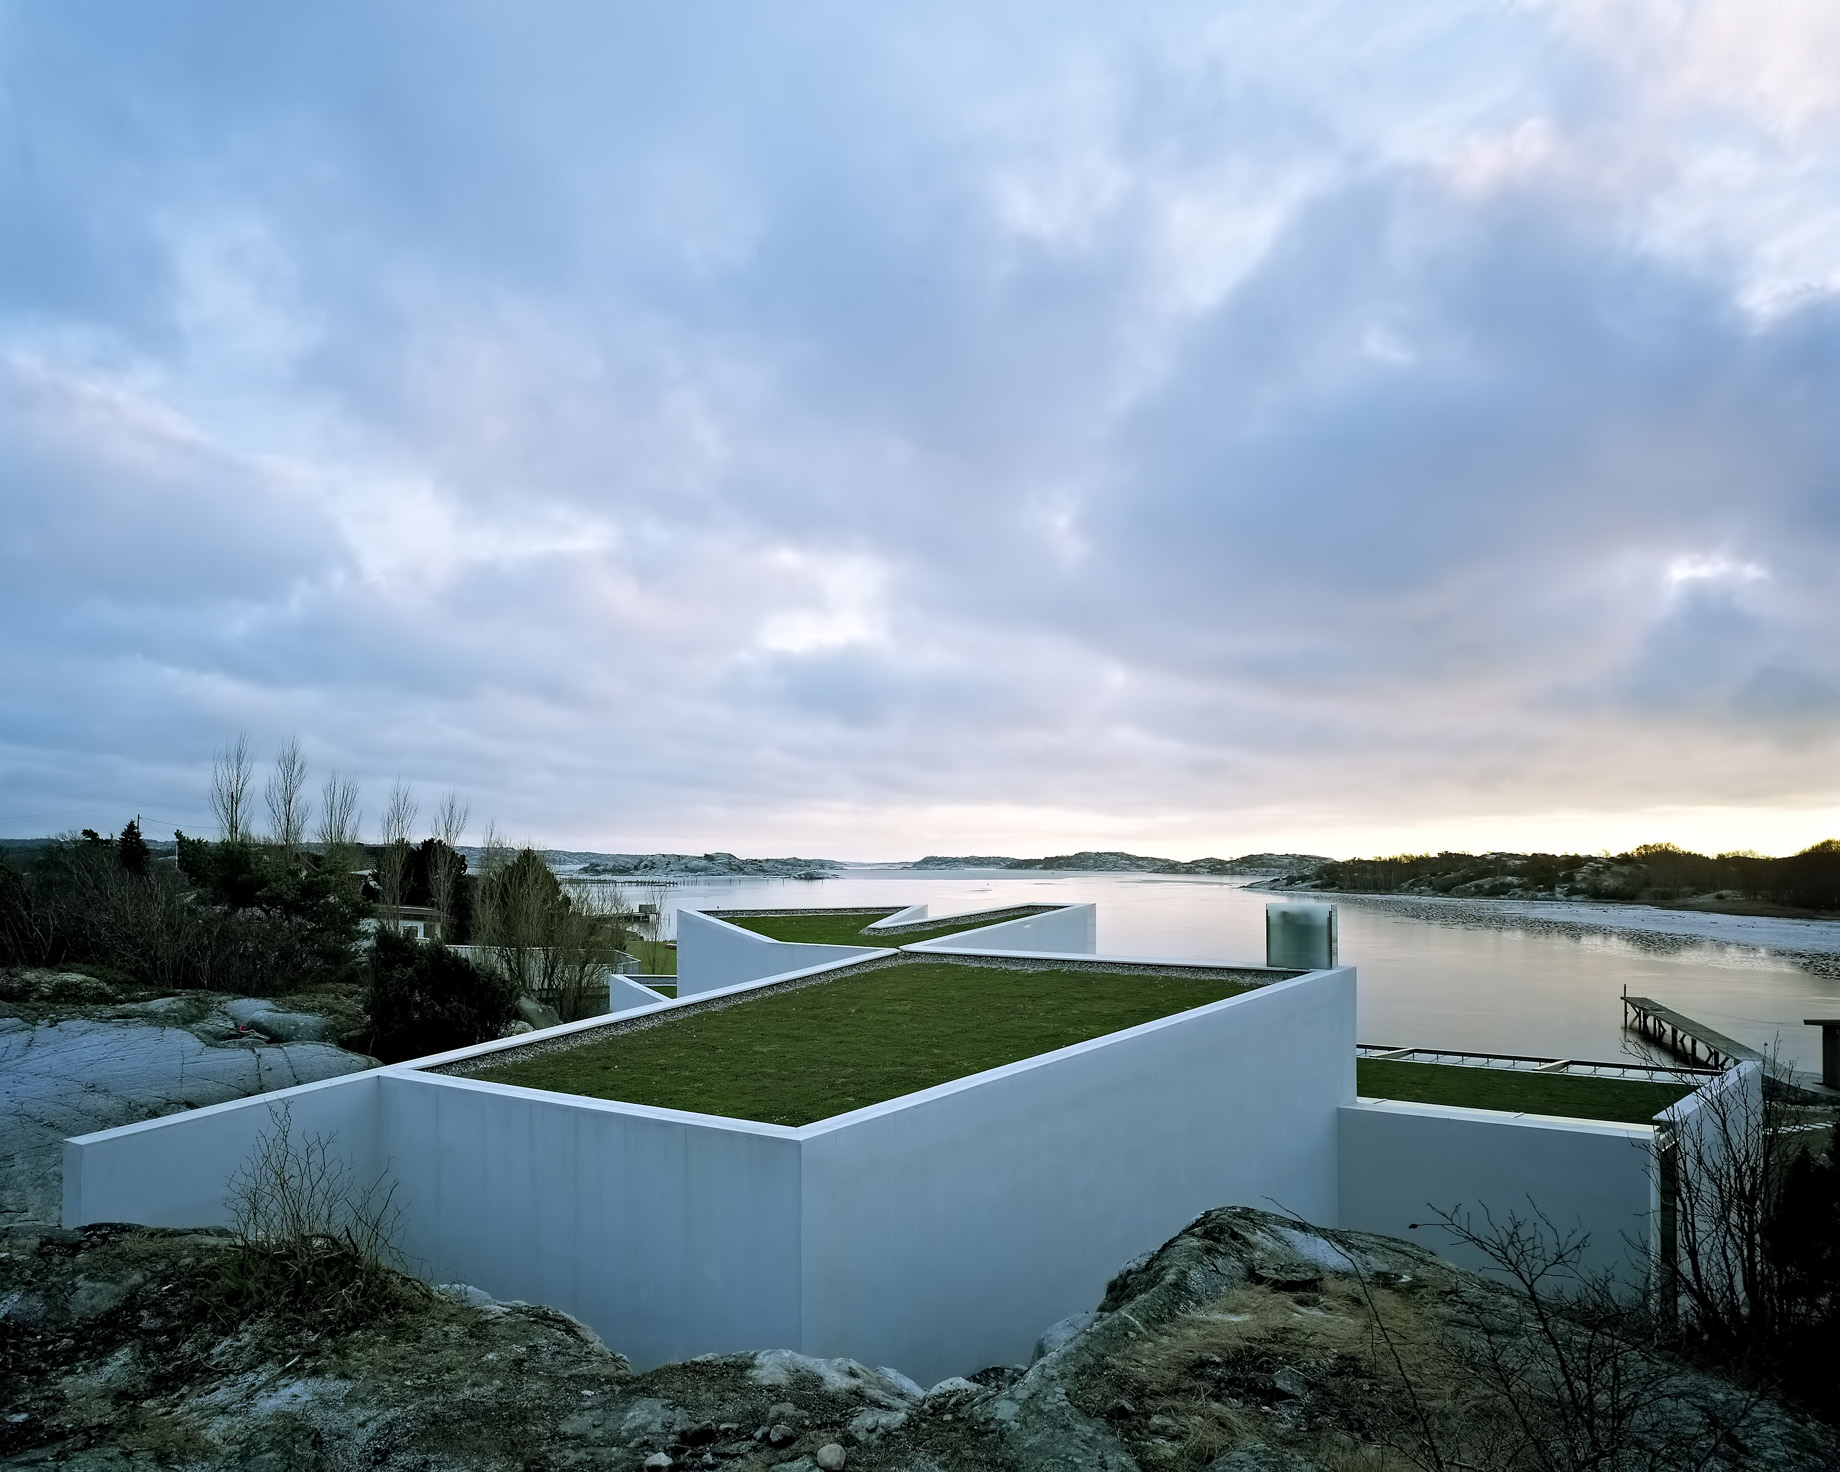 Amundon House Luxury Residence - Brottkärr, Gothenburg, Västra Götaland, Sweden